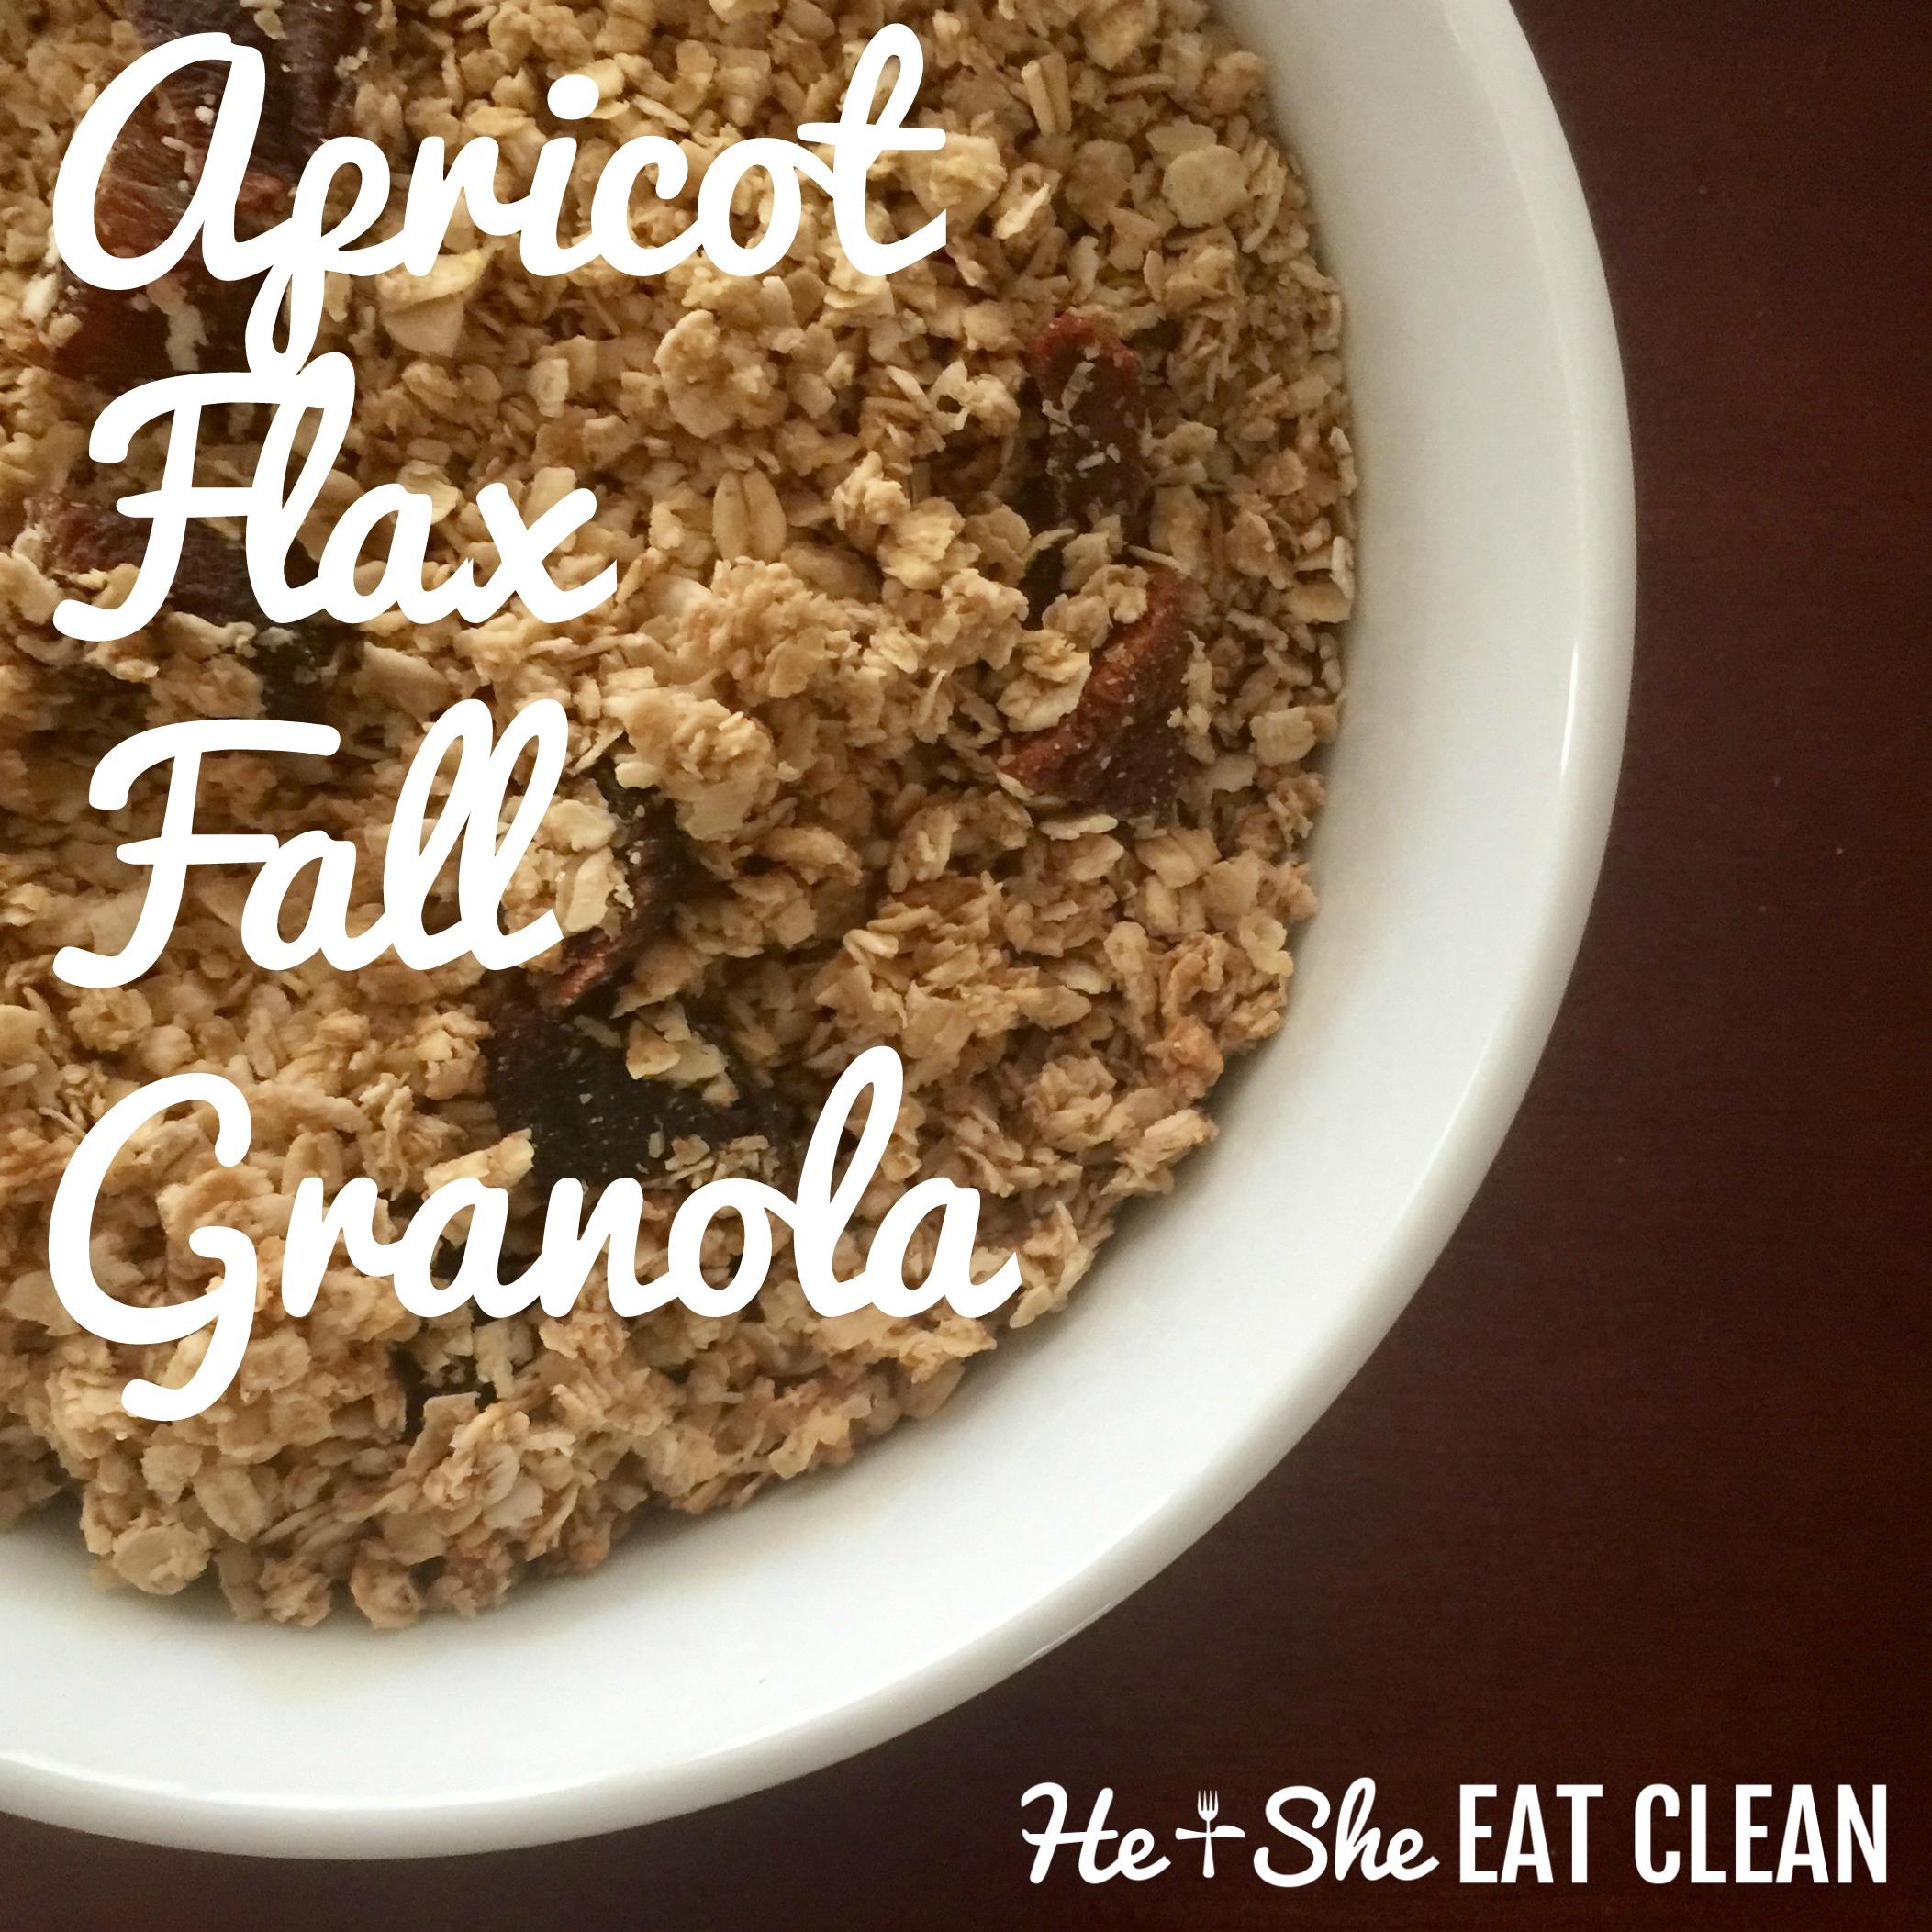 Apricot Flax Fall Granola